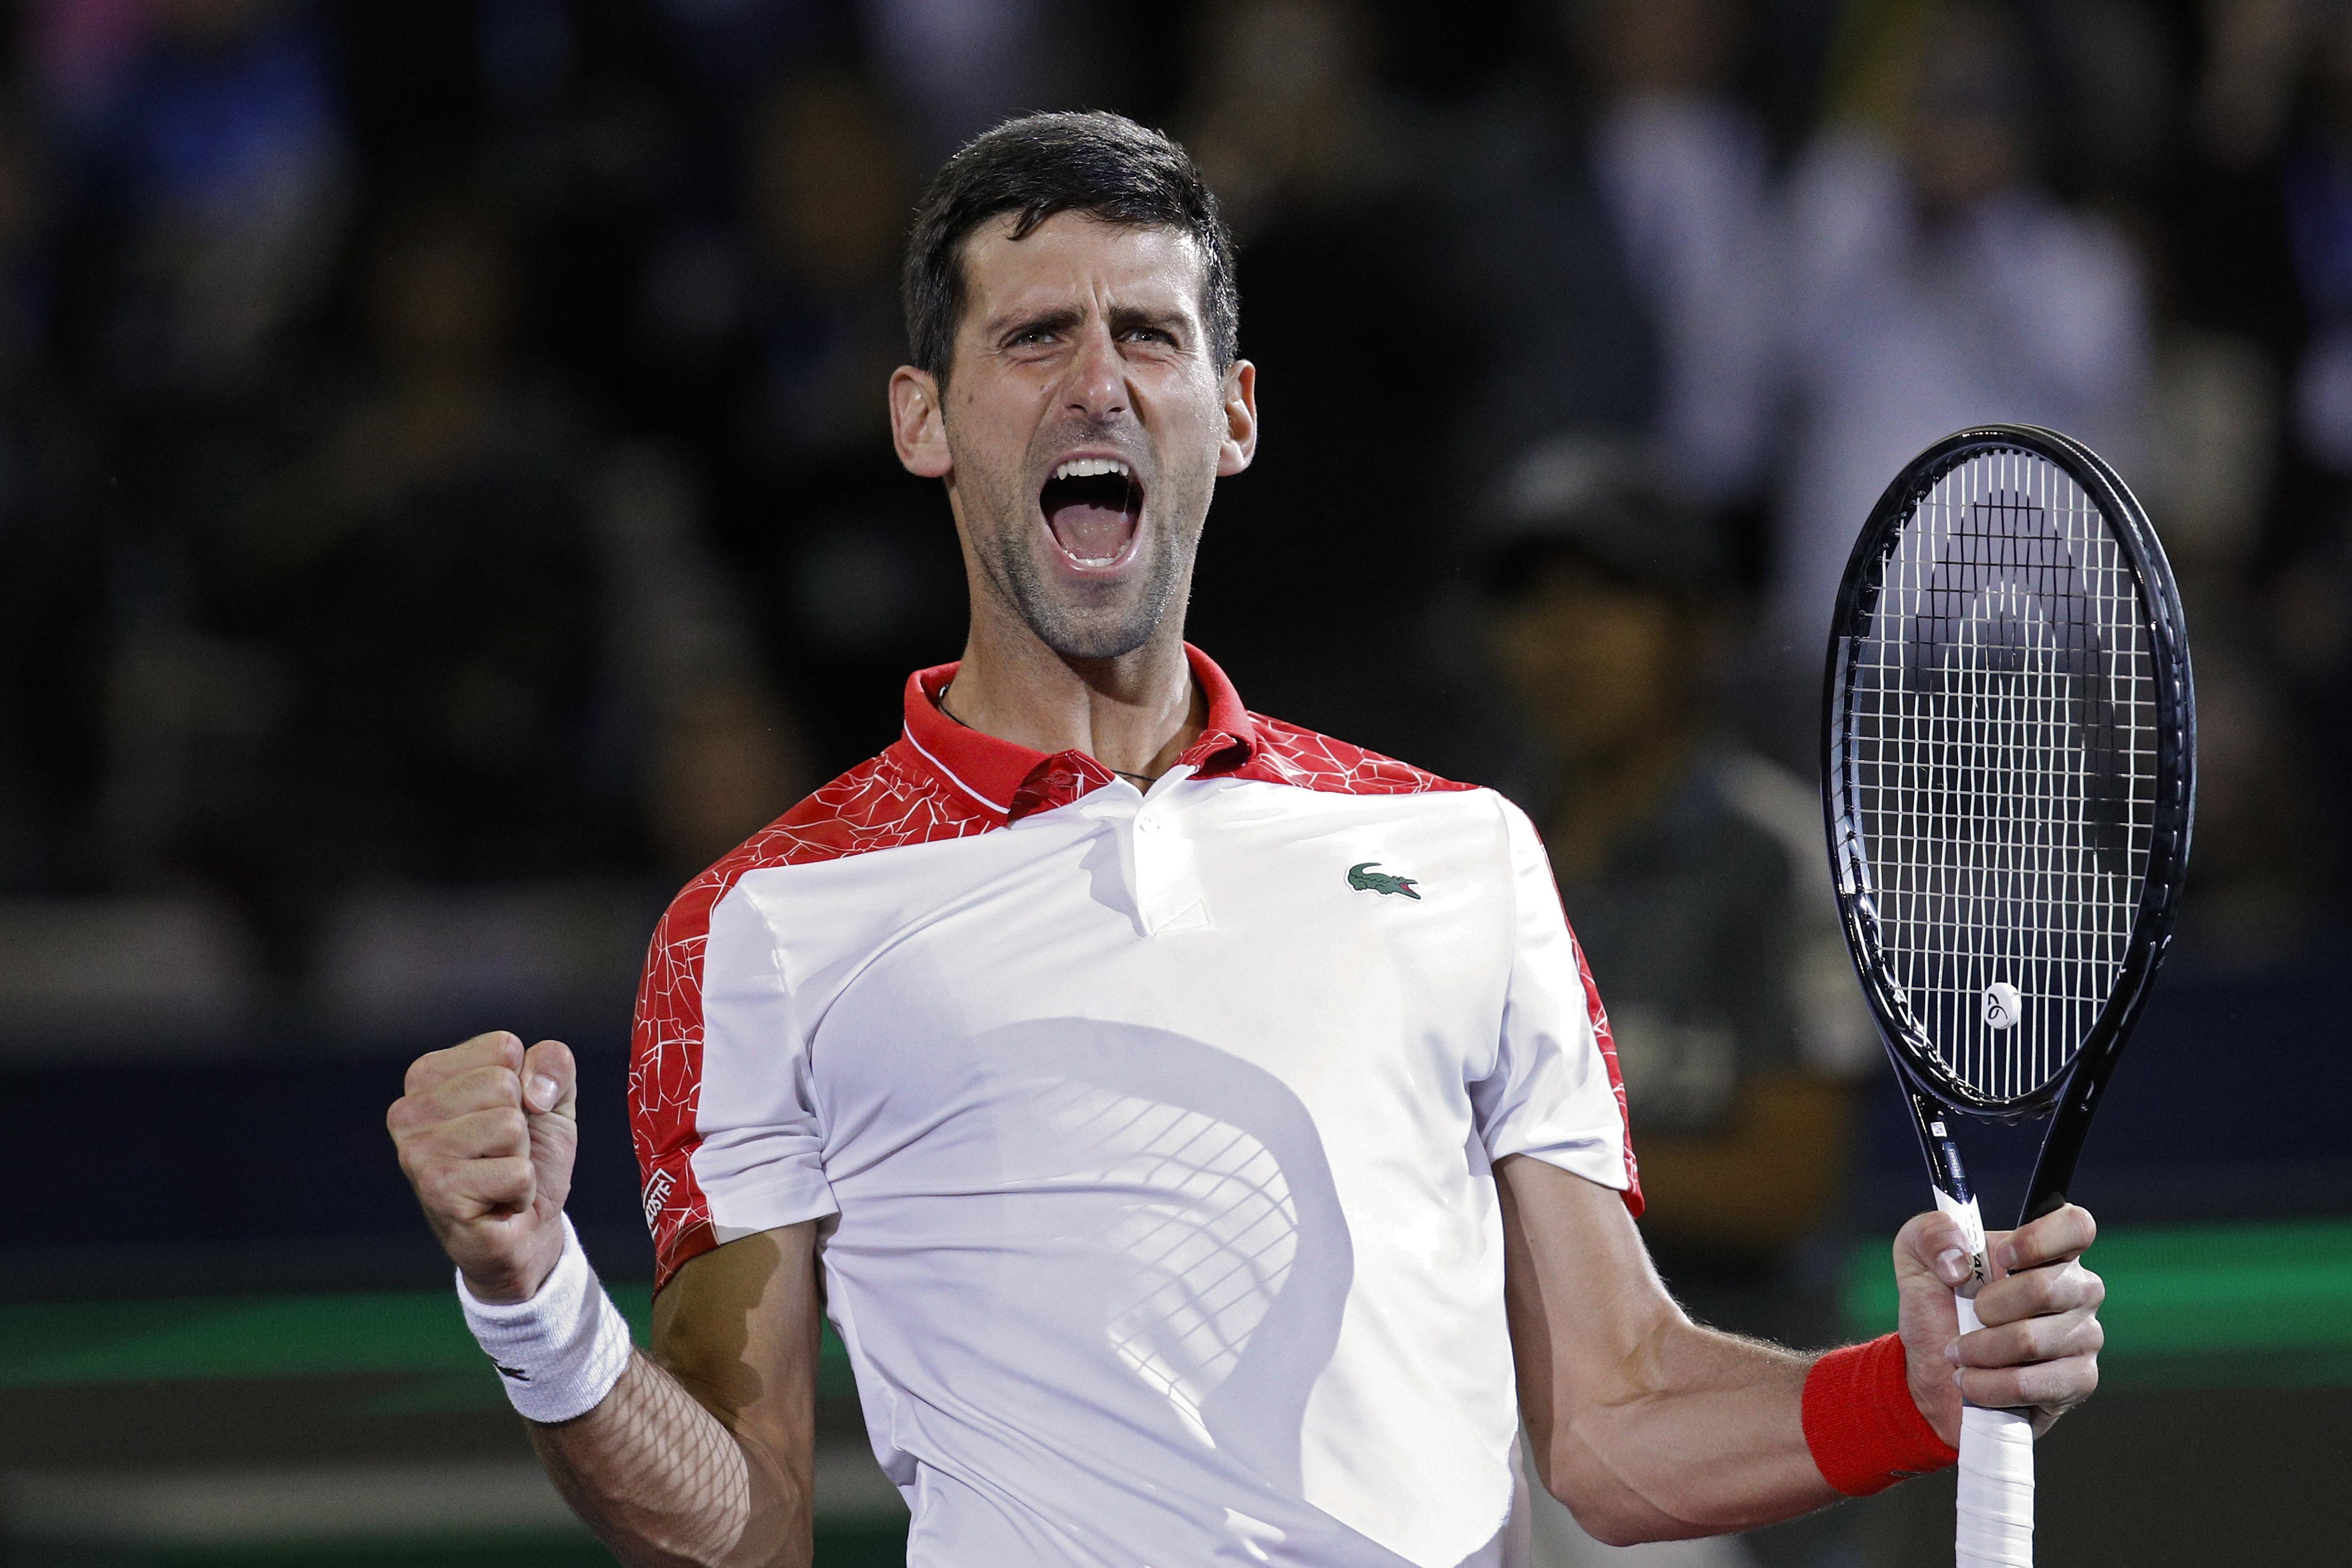 Novak Djokovic is now guaranteed to finish the year as World No 1